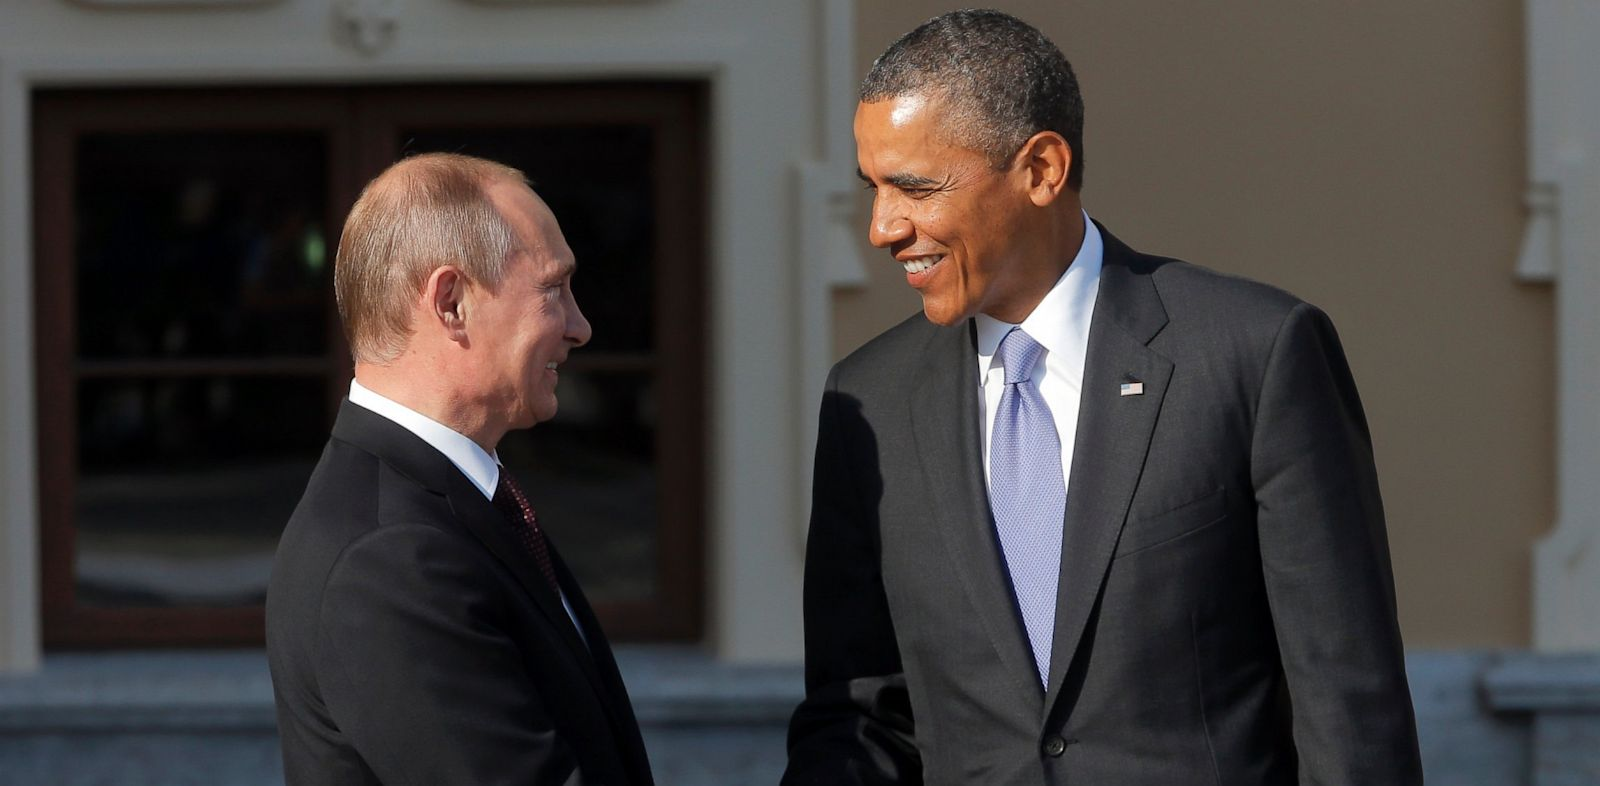 PHOTO: ladimir Putin,